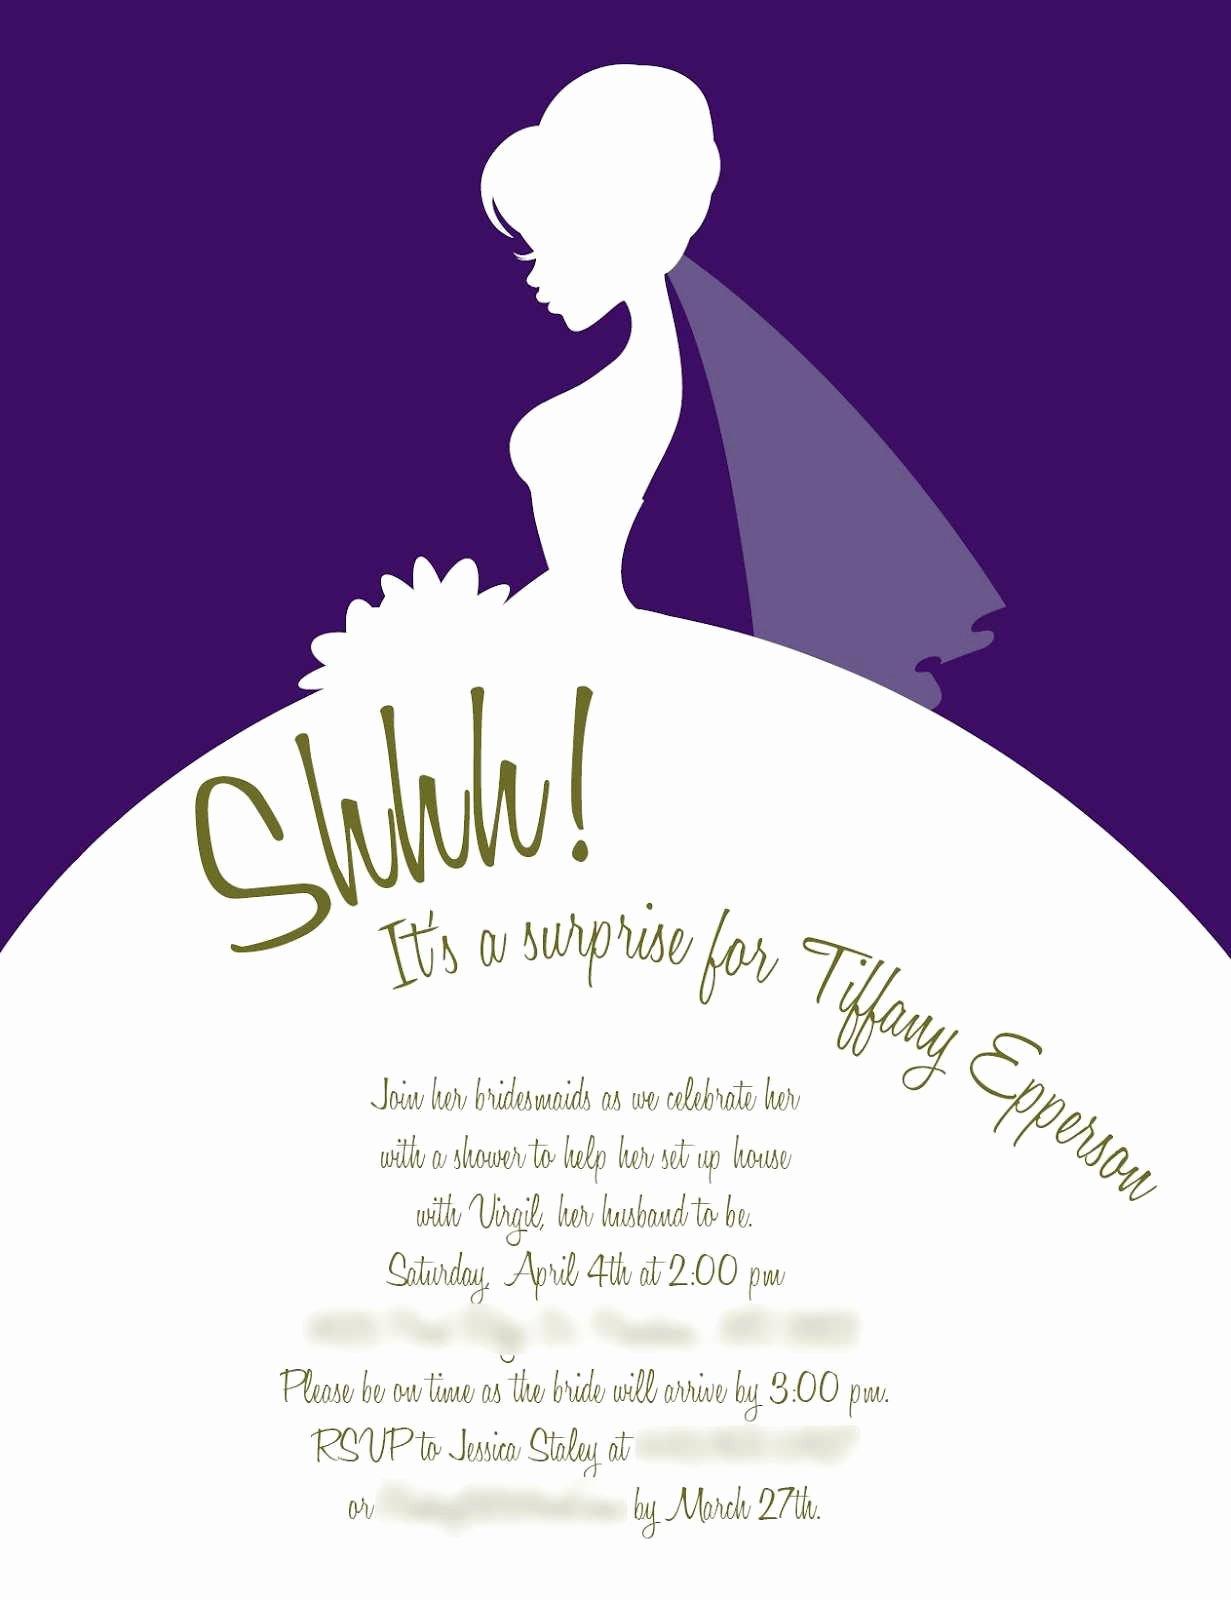 Bridal Shower Invite Template Luxury Bridal Shower Invite Template Chanel Bridal Shower